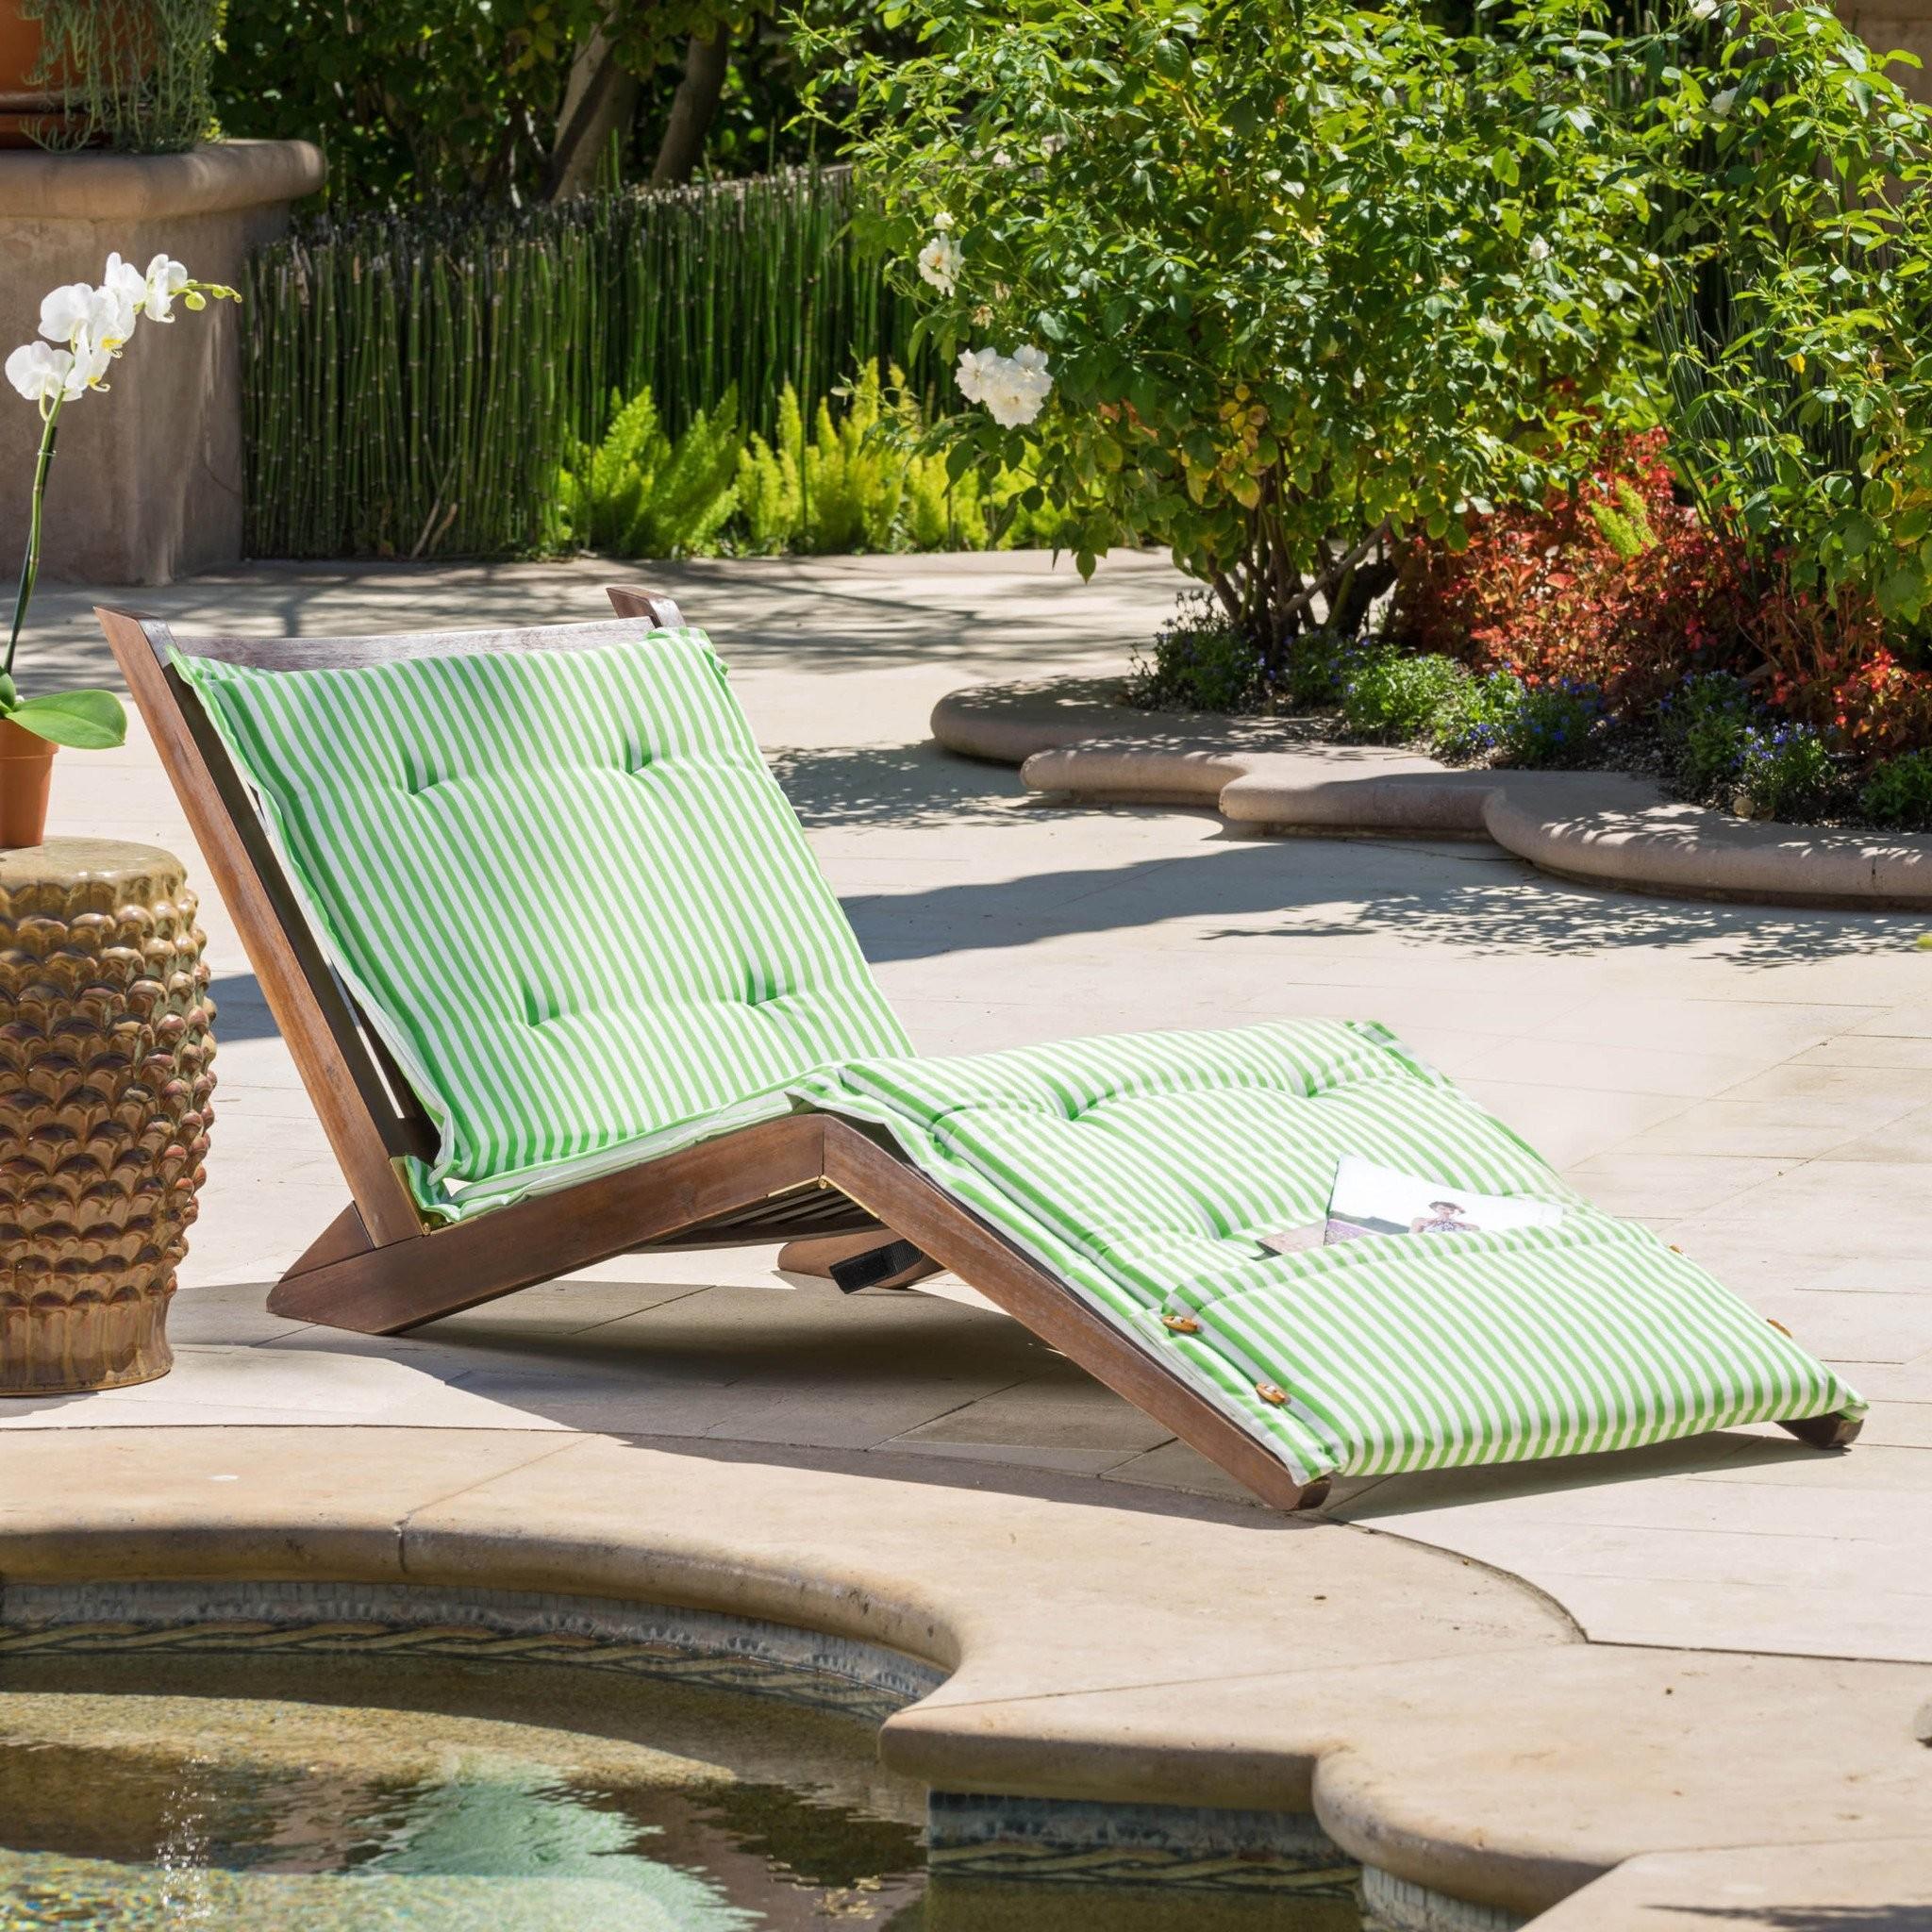 Midori Mahogany Wood Folding Chaise Lounger Chair...